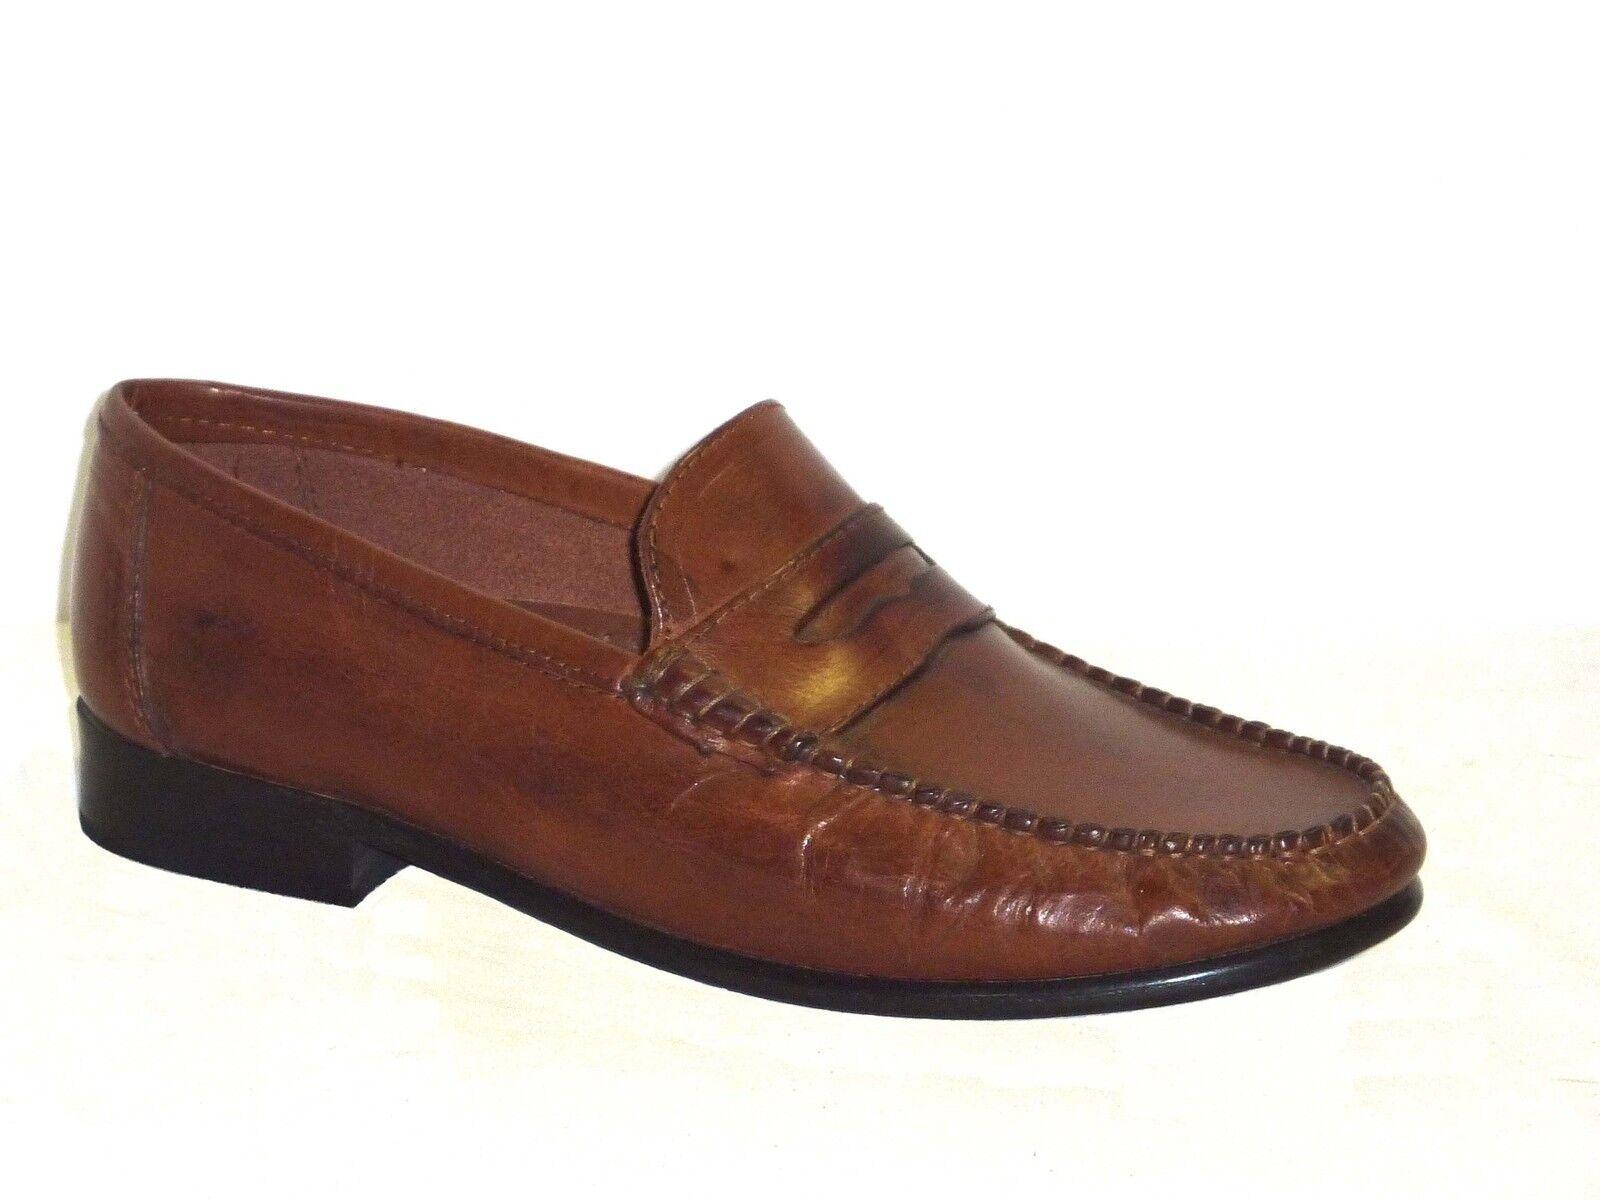 Mokassin Schuhe elegante Männerschuhe braunes Leder n.42